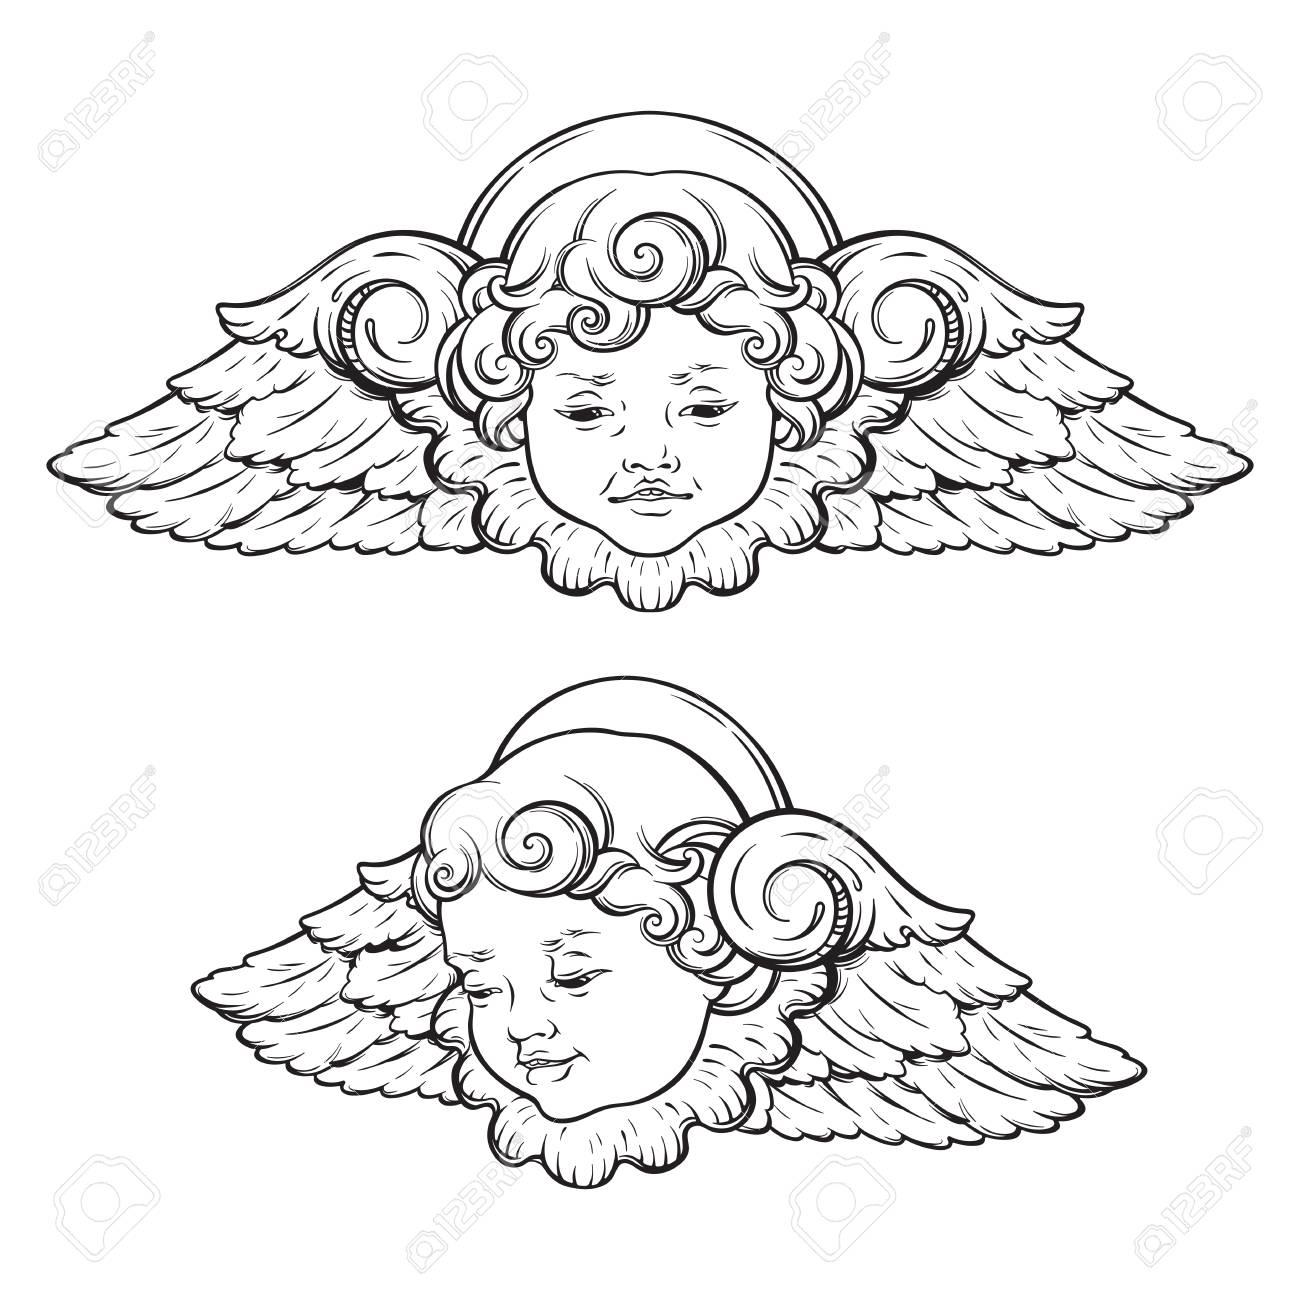 Cherub Cute Winged Curly Smiling Baby Boy Angel Set Isolated 1300x1300